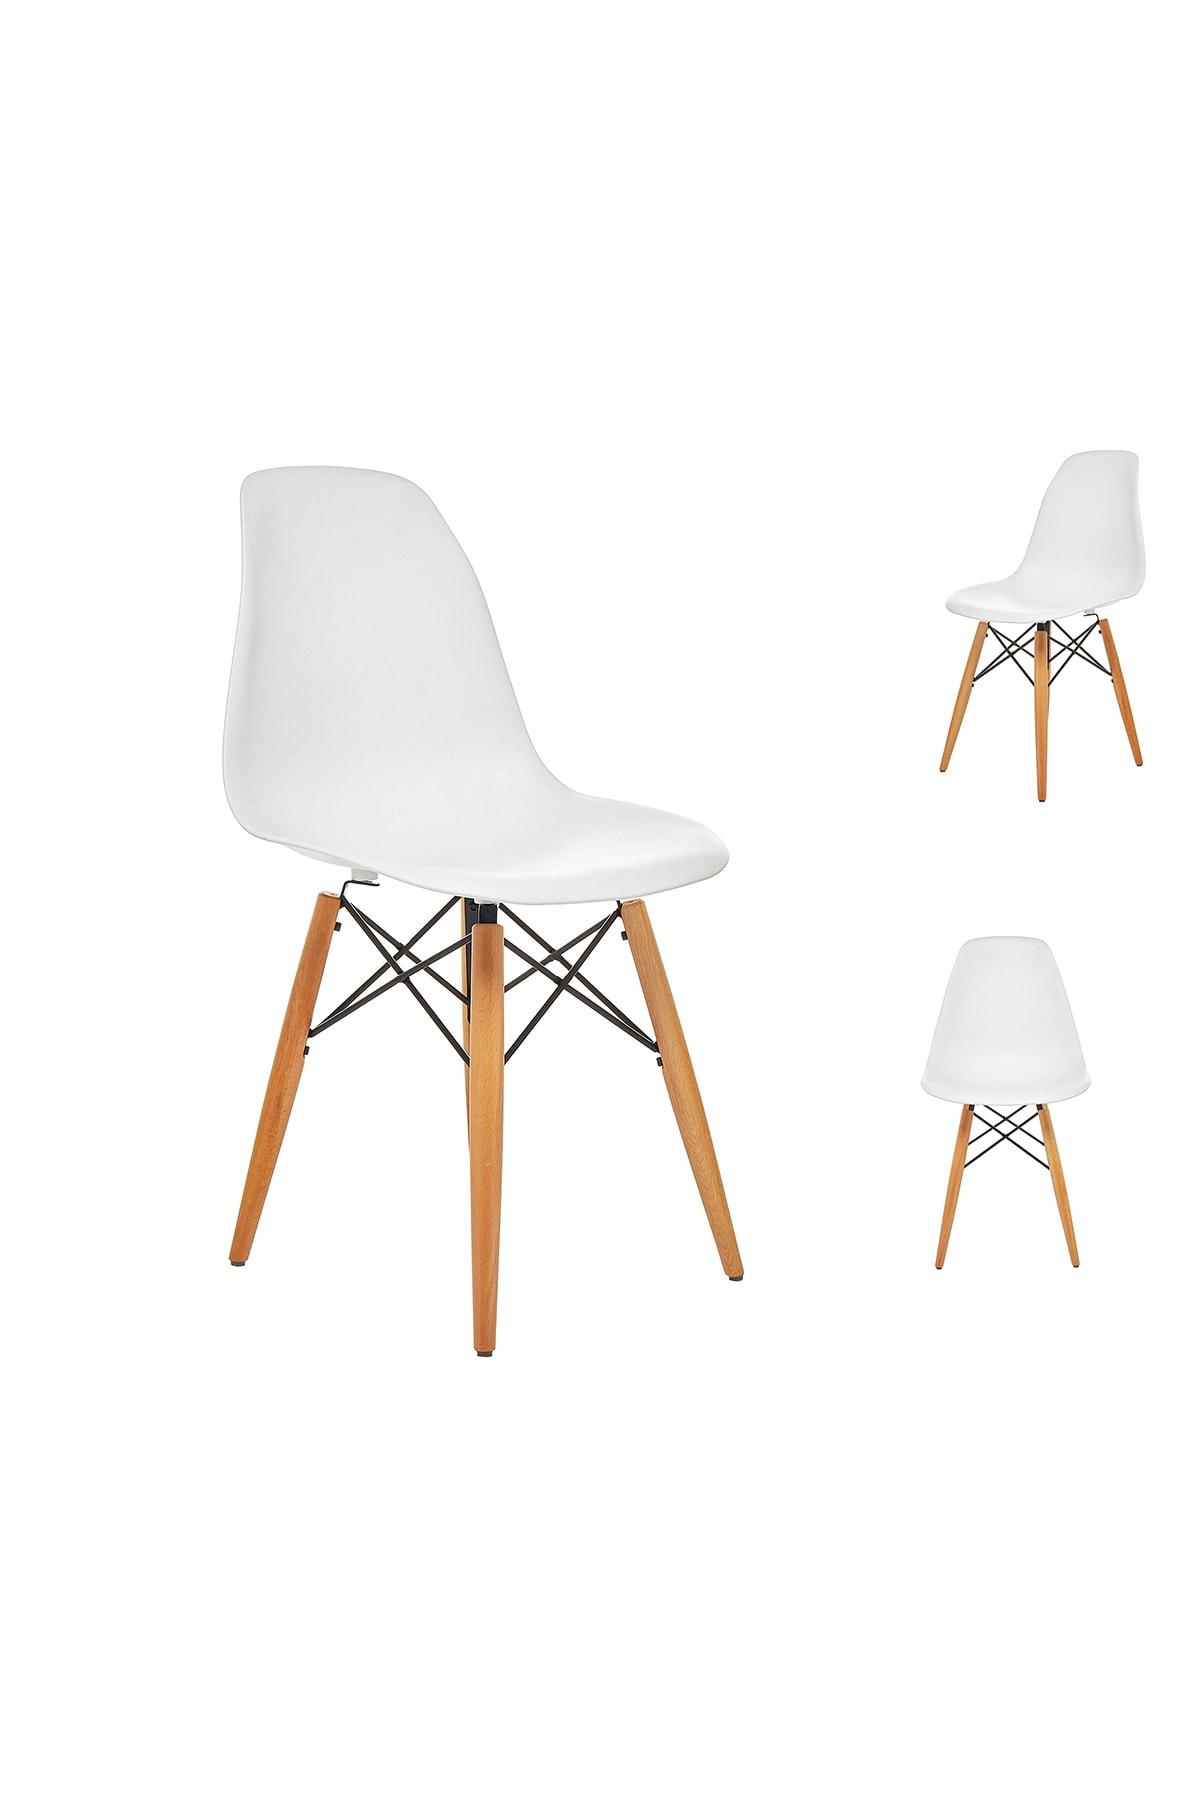 Seduna Beyaz Eames Sandalye Natural Ahşap Ayaklı   2 Adet 1